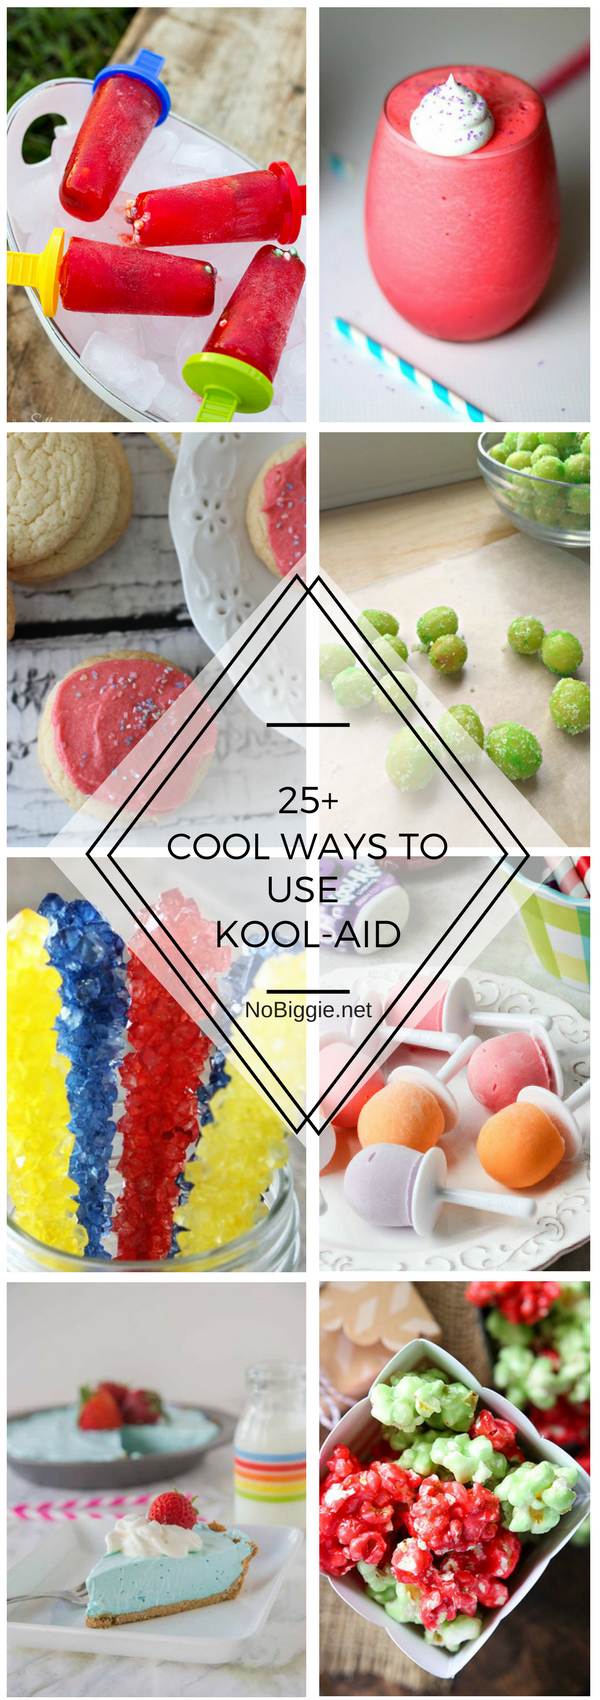 25+ Cool Ways To Use Kool-Aid | NoBiggie.net